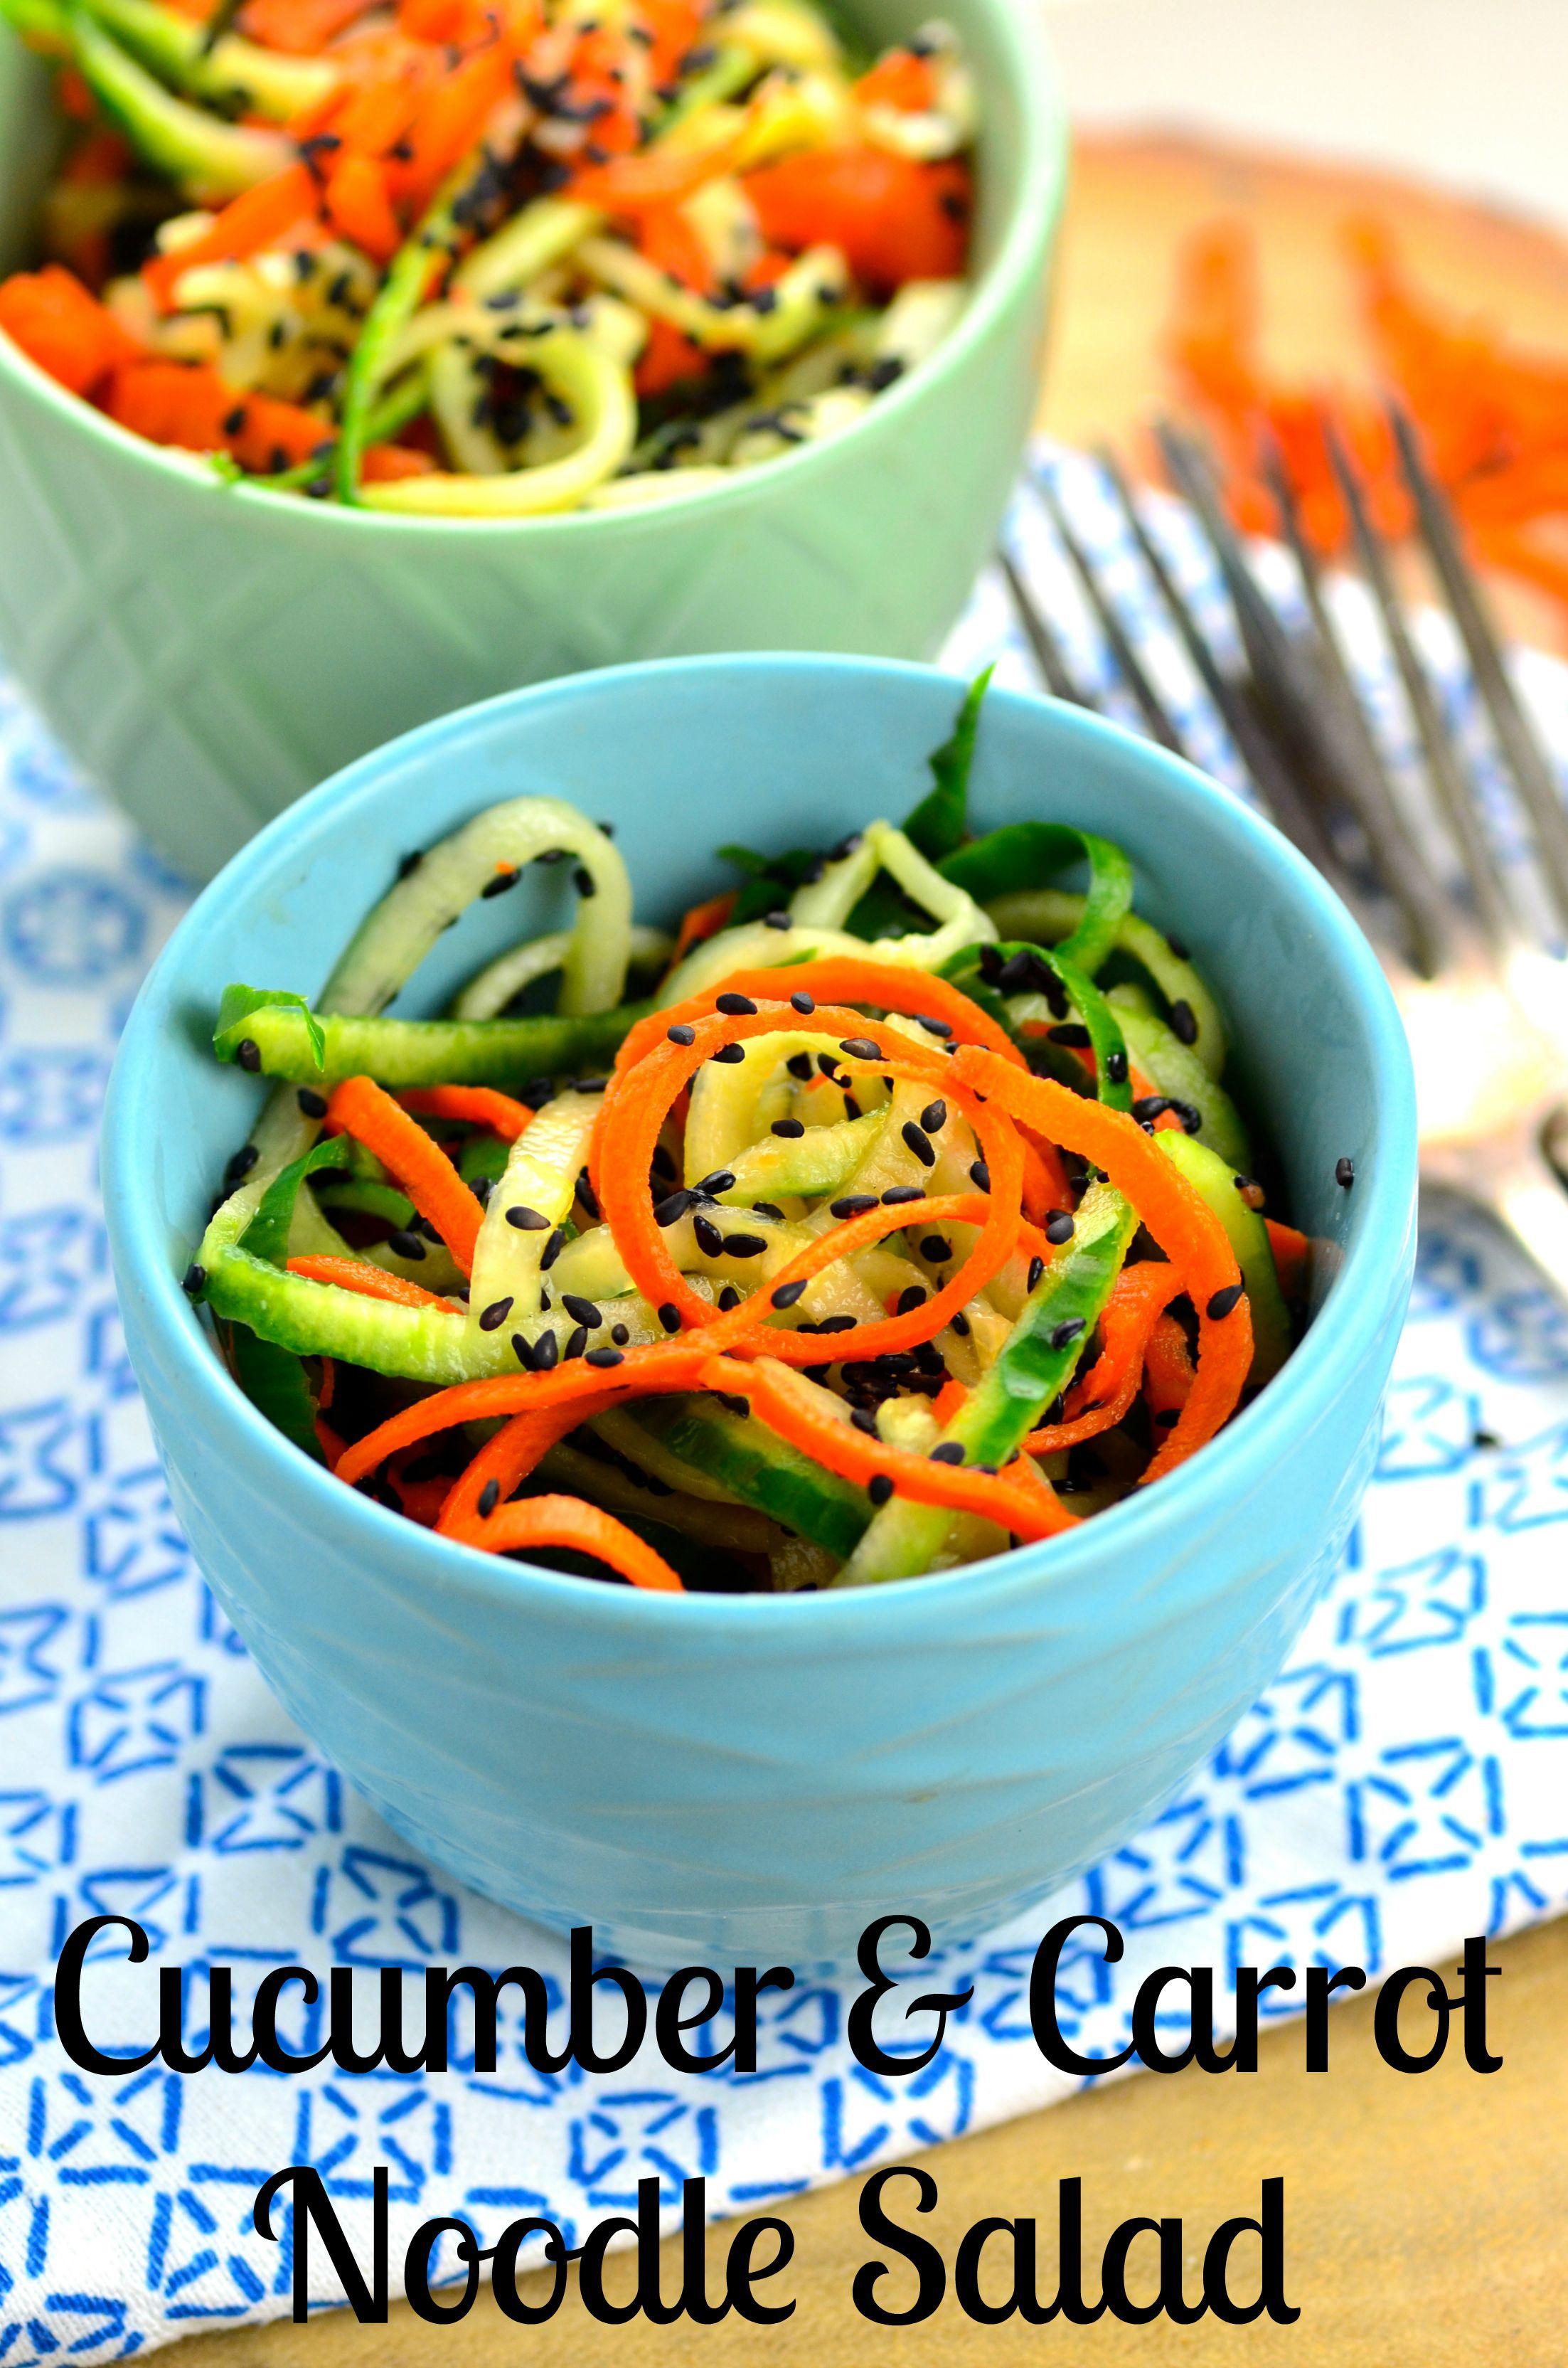 Spiralized Cucumber & Carrot Salad